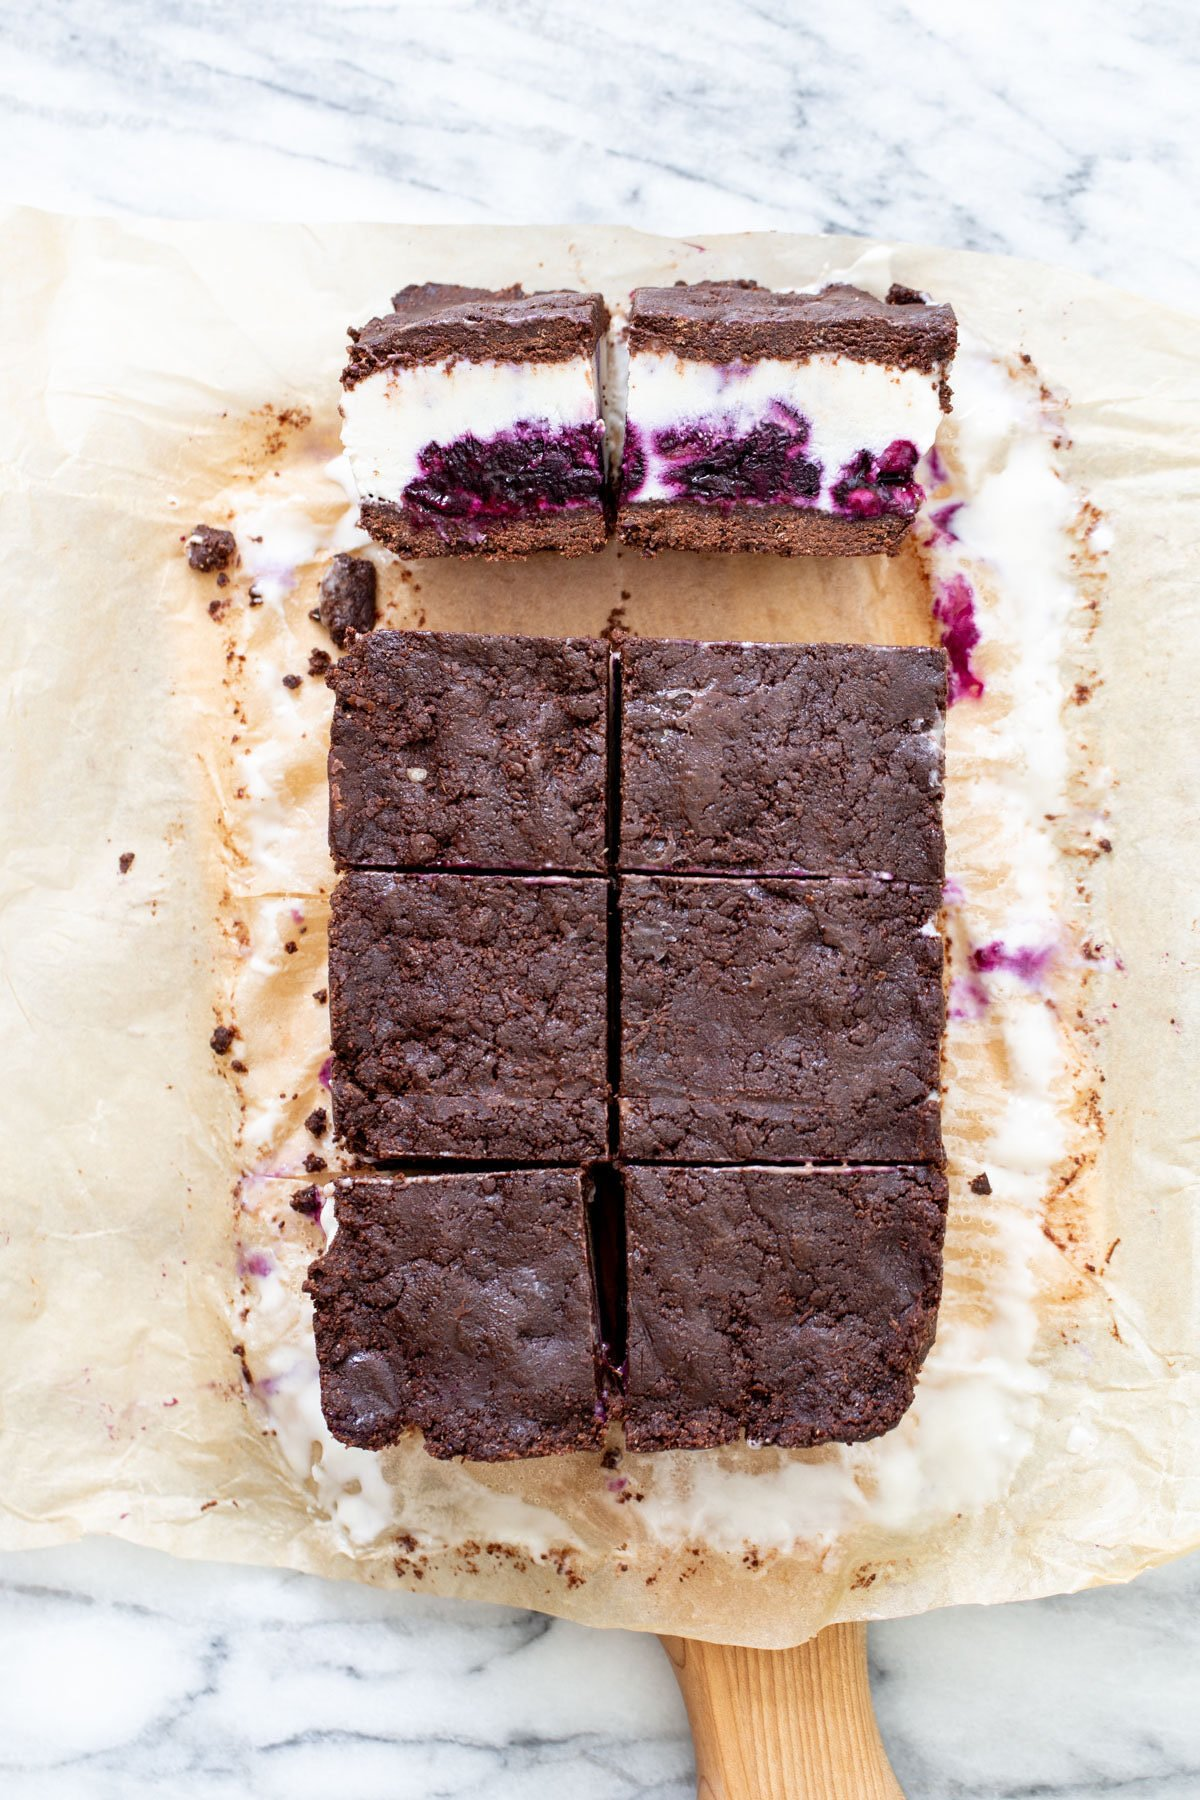 vegan vanilla ice cream sandwiches being cut into squares